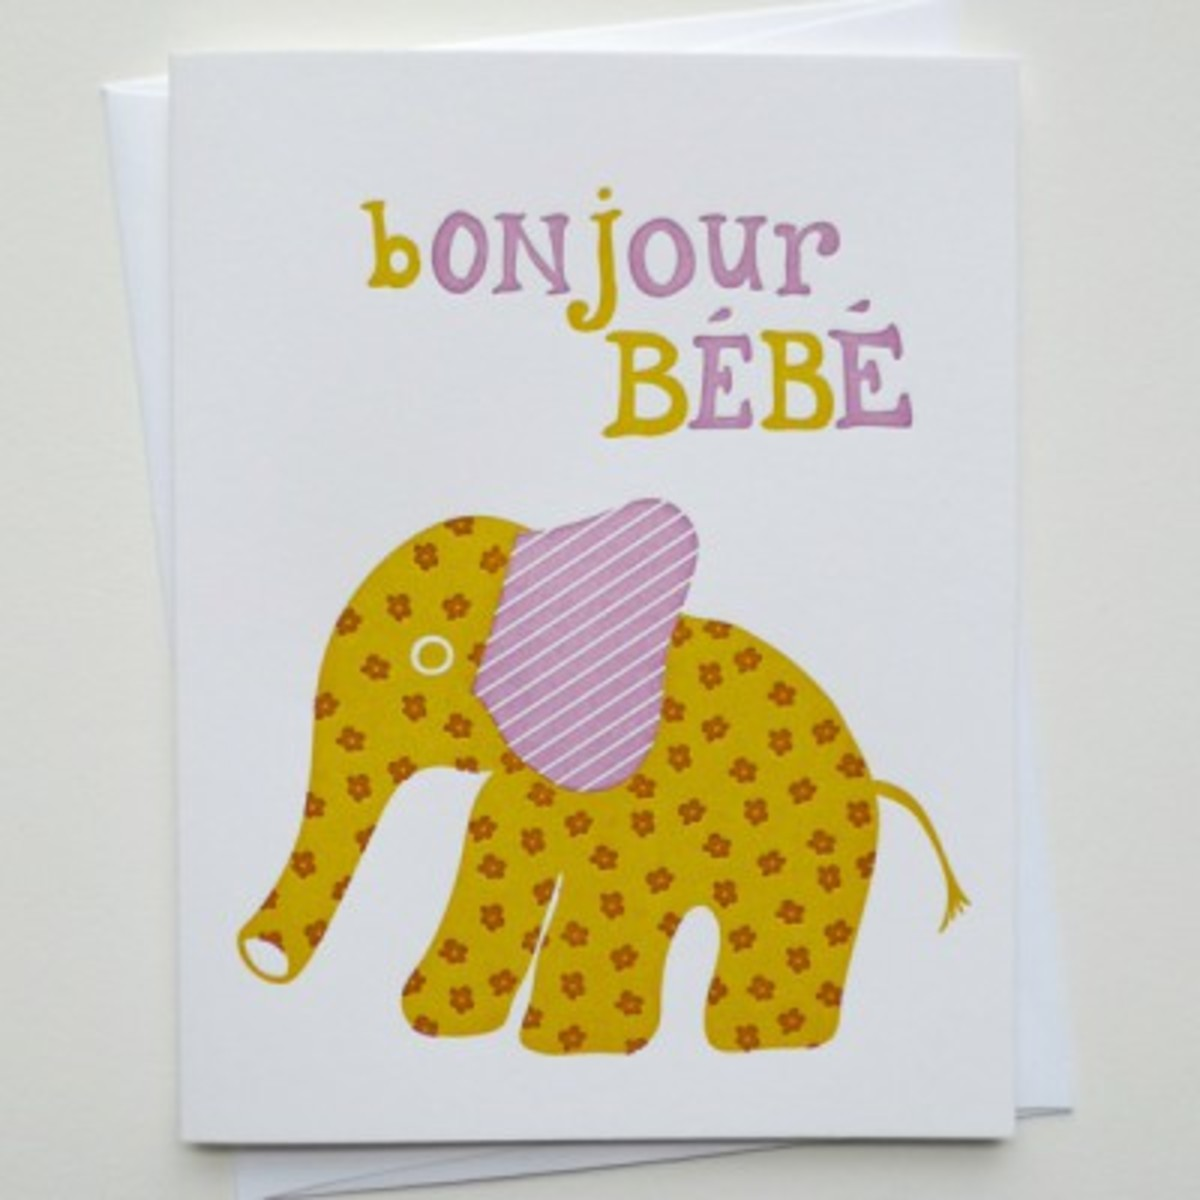 Bonjour_bebe1-400x400